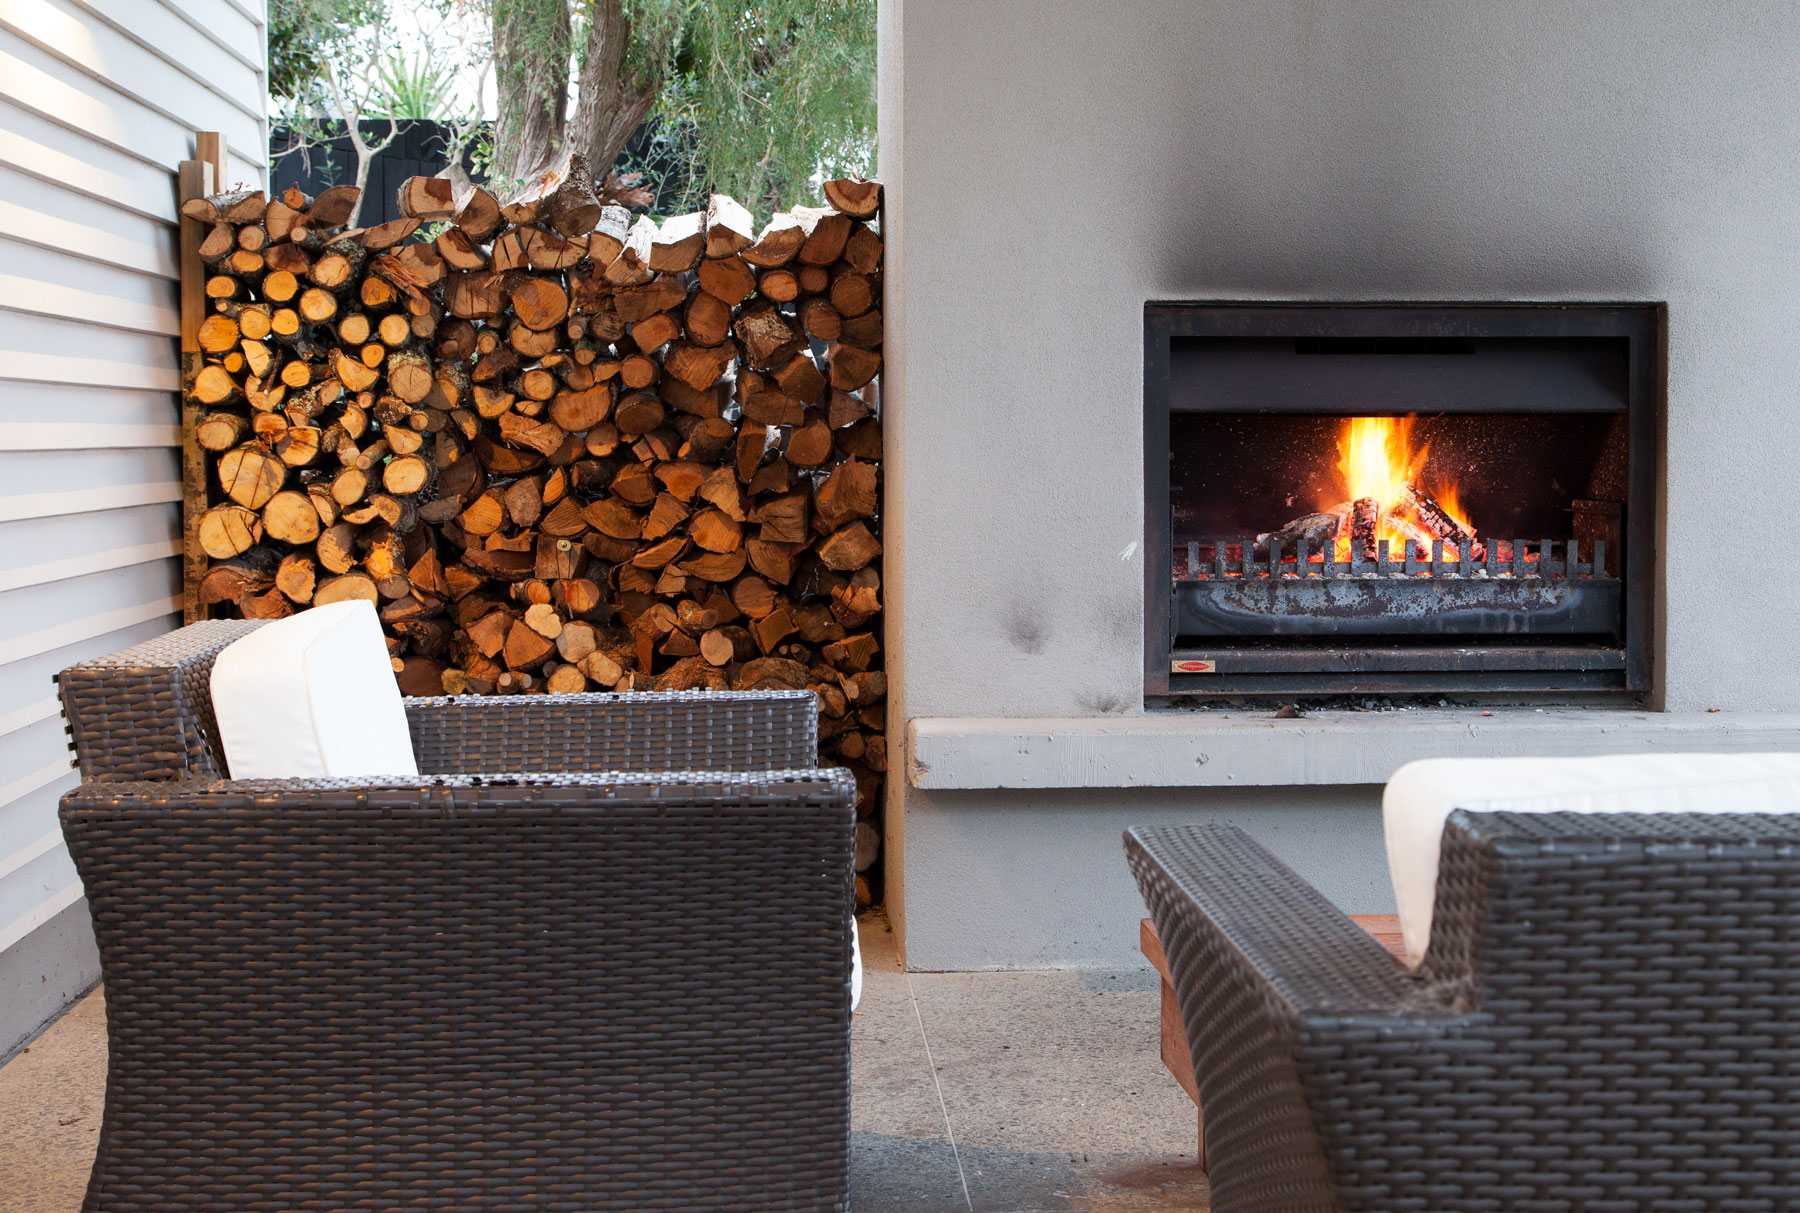 M-Leuschke-Kahn-Architects-Fireplace-IMG_3525.jpg